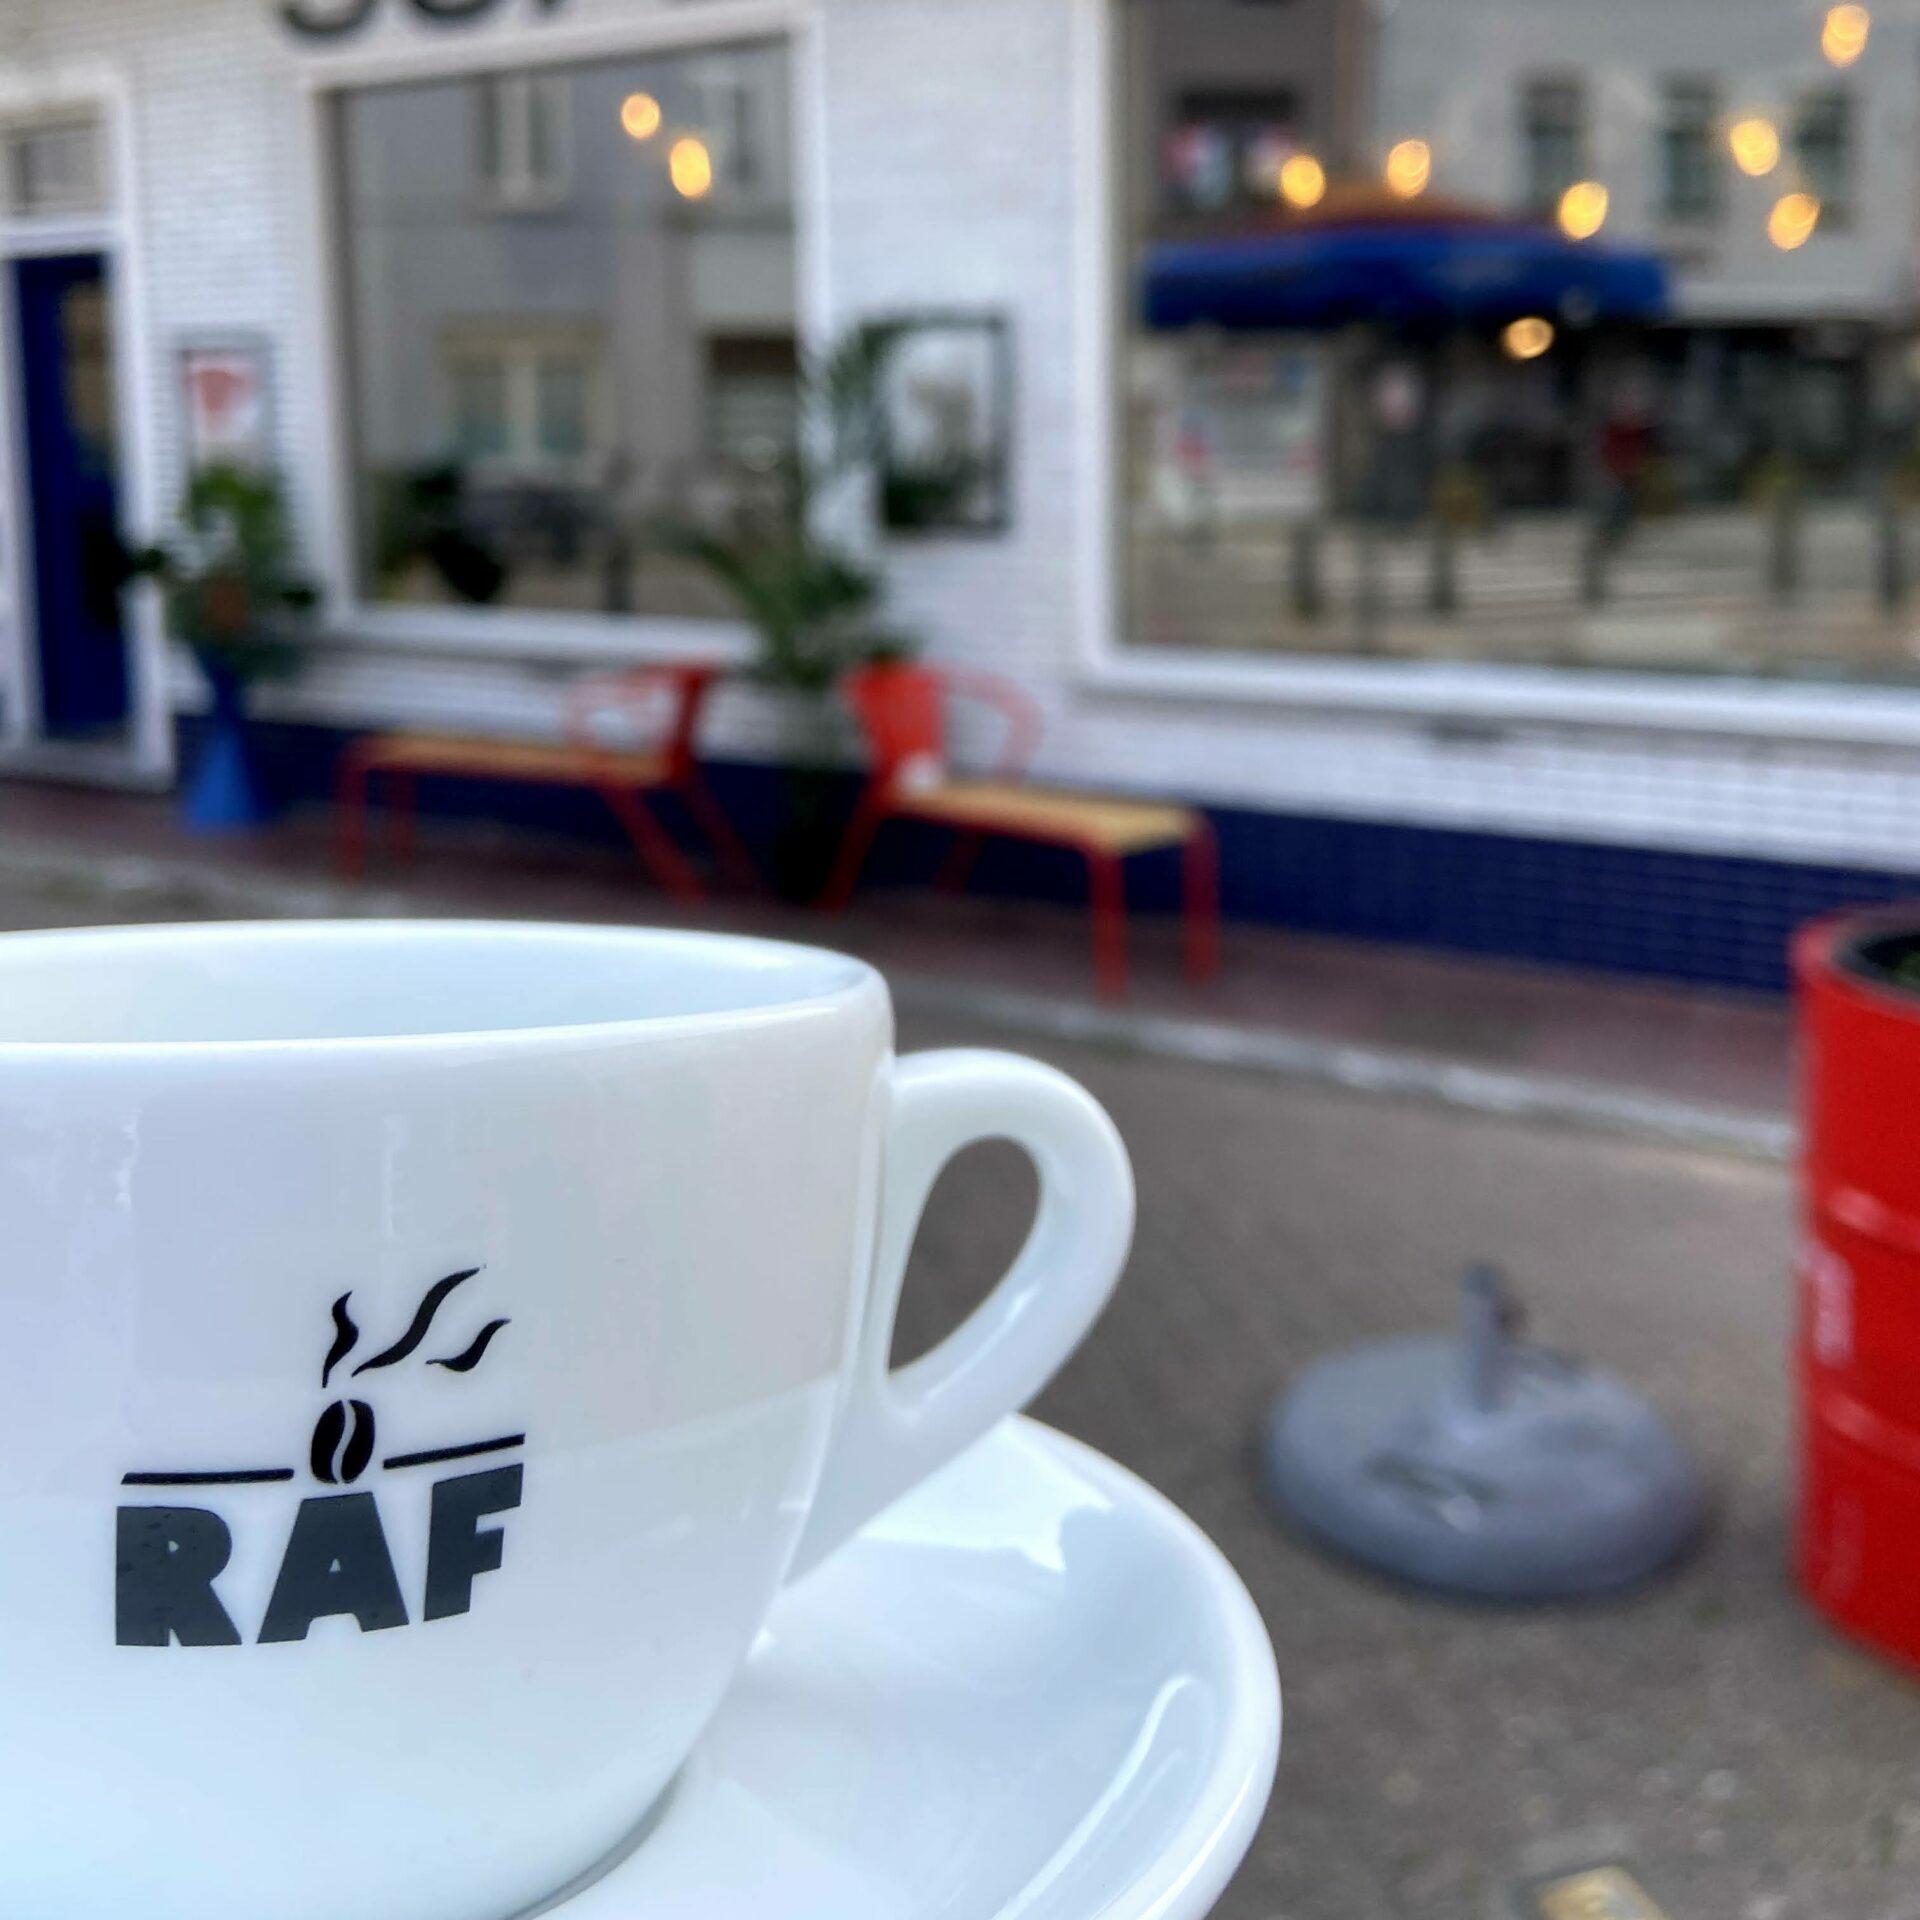 koffiehuis, koffiebar leverancier